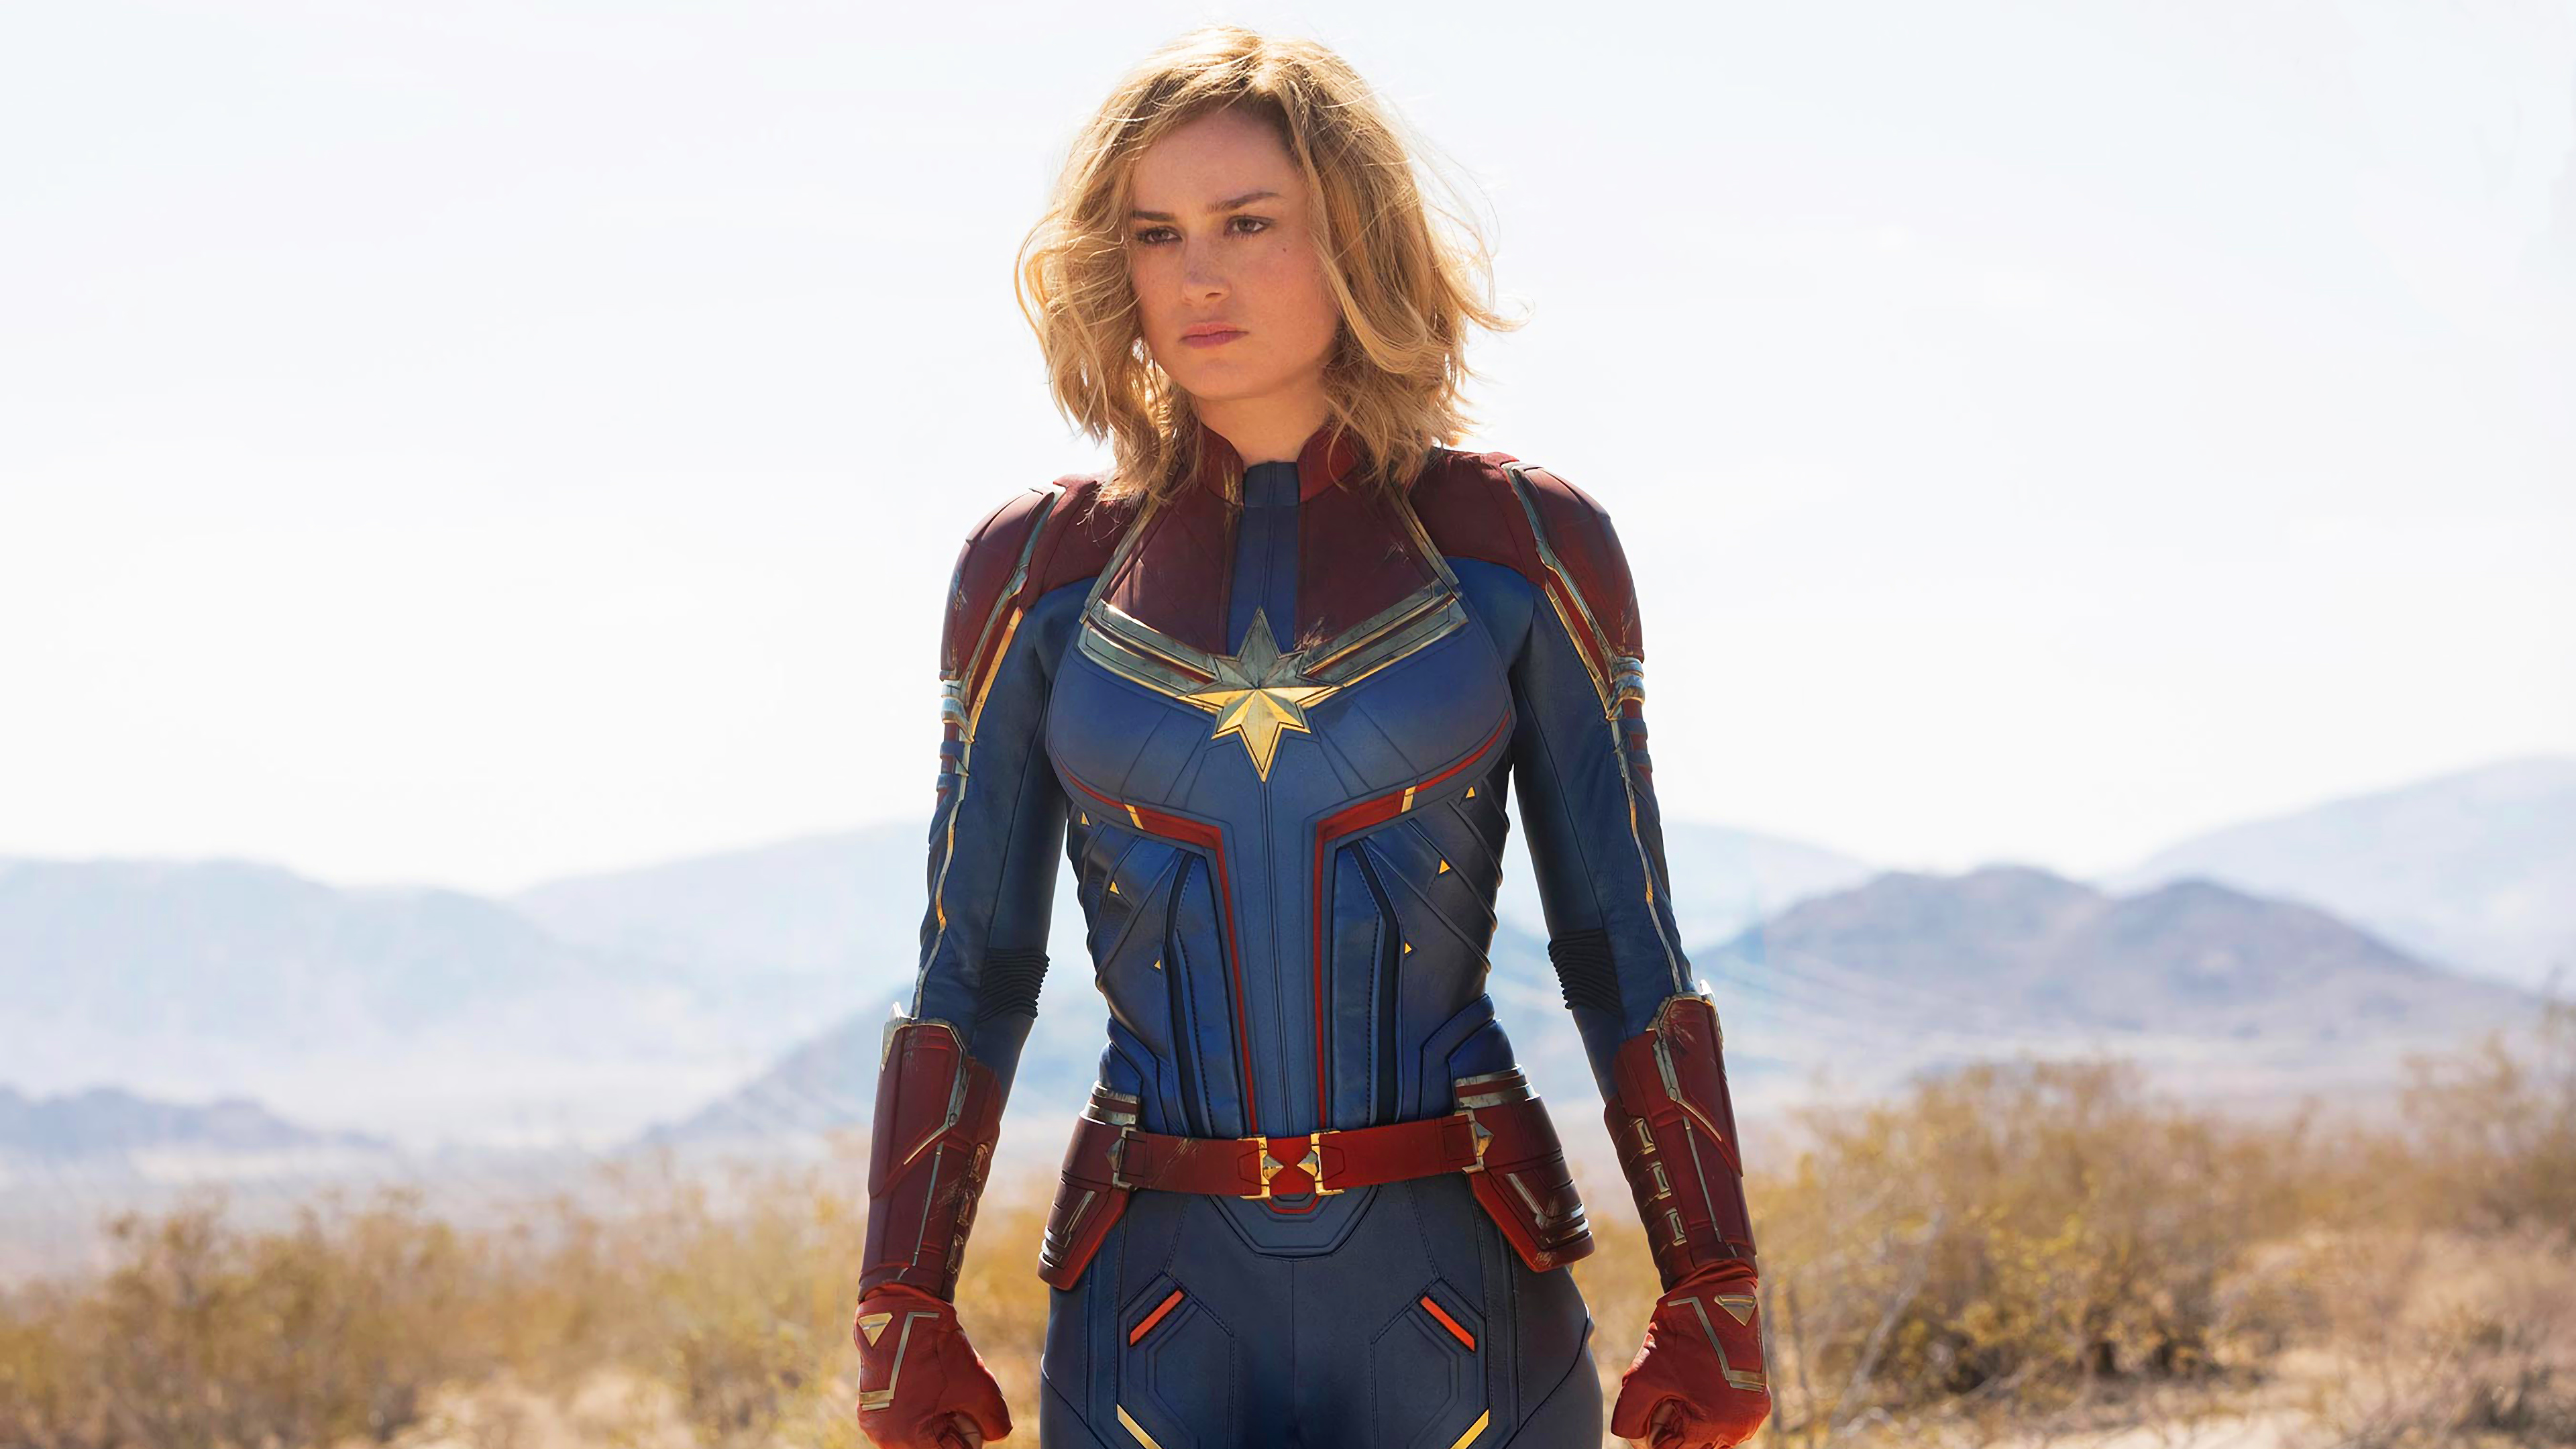 captain marvel movie 2019 carol danvers brie larson 4k wallpaper 1544829326 - Captain Marvel Movie 2019 Carol Danvers Brie Larson 4K Wallpaper - Captain Marvel (Movie 2019), Captain Marvel (Carol Danvers)